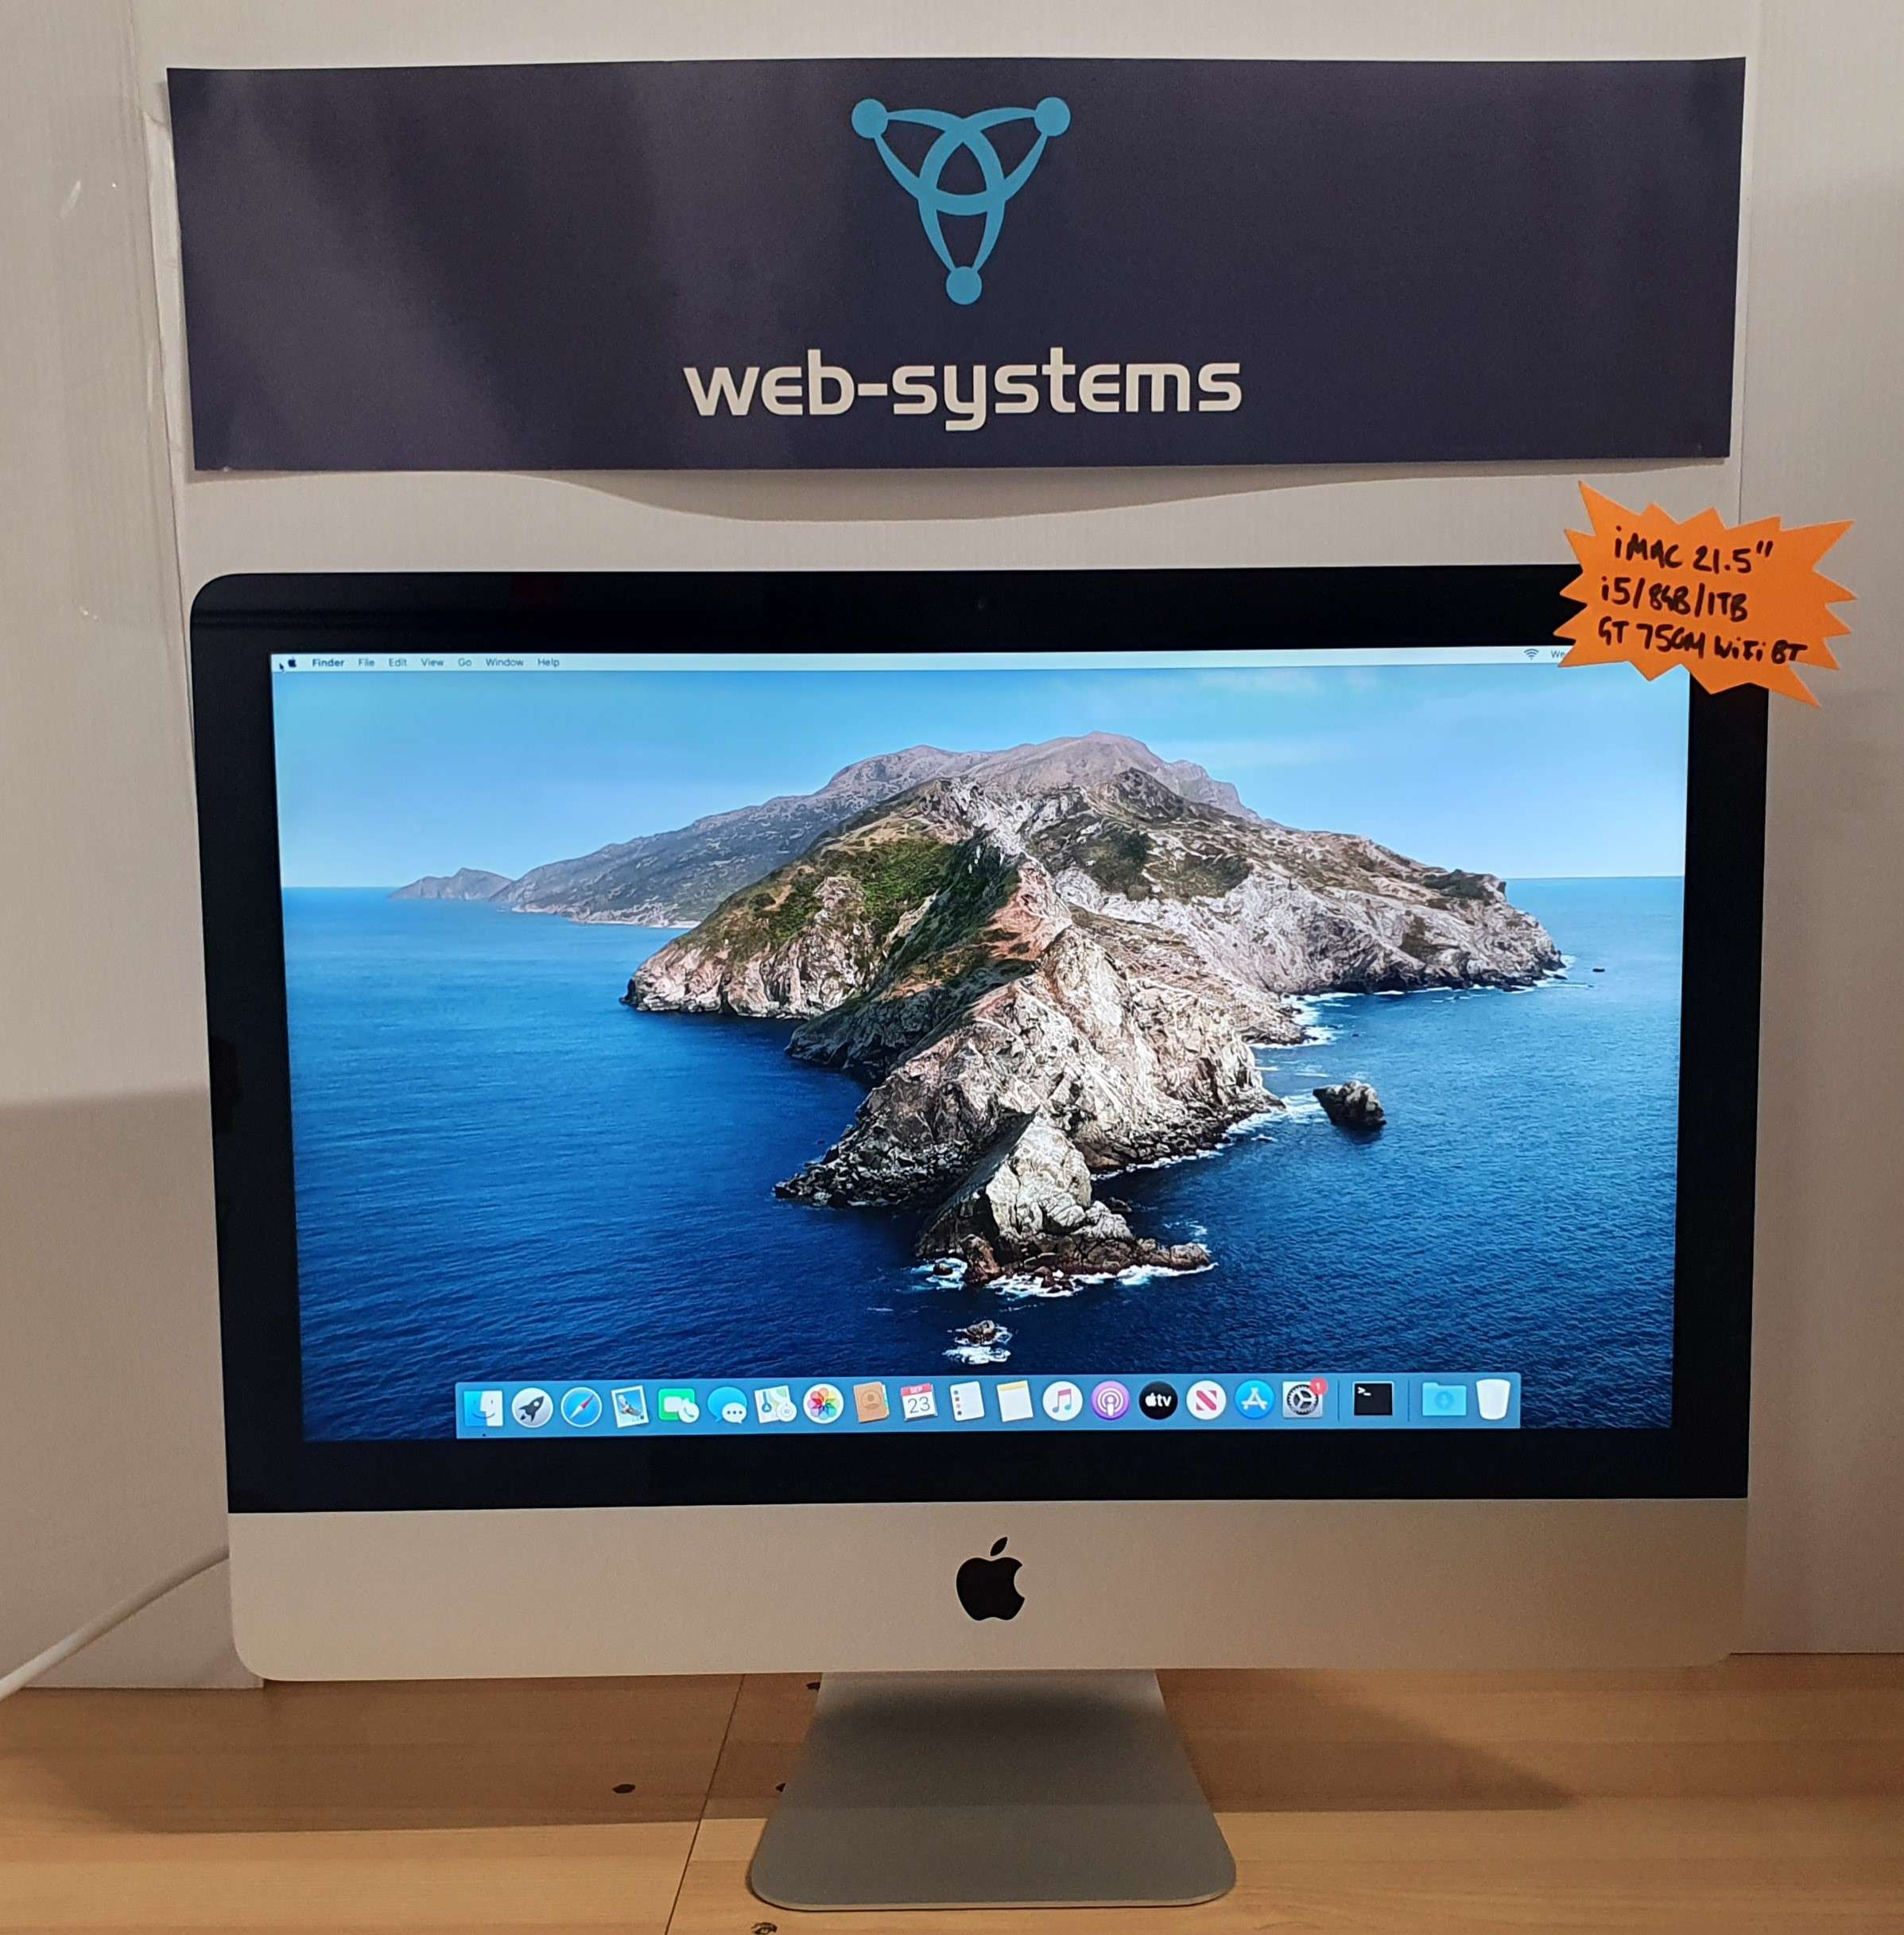 iMac 21.5-inch, (Late 2013) Refurb